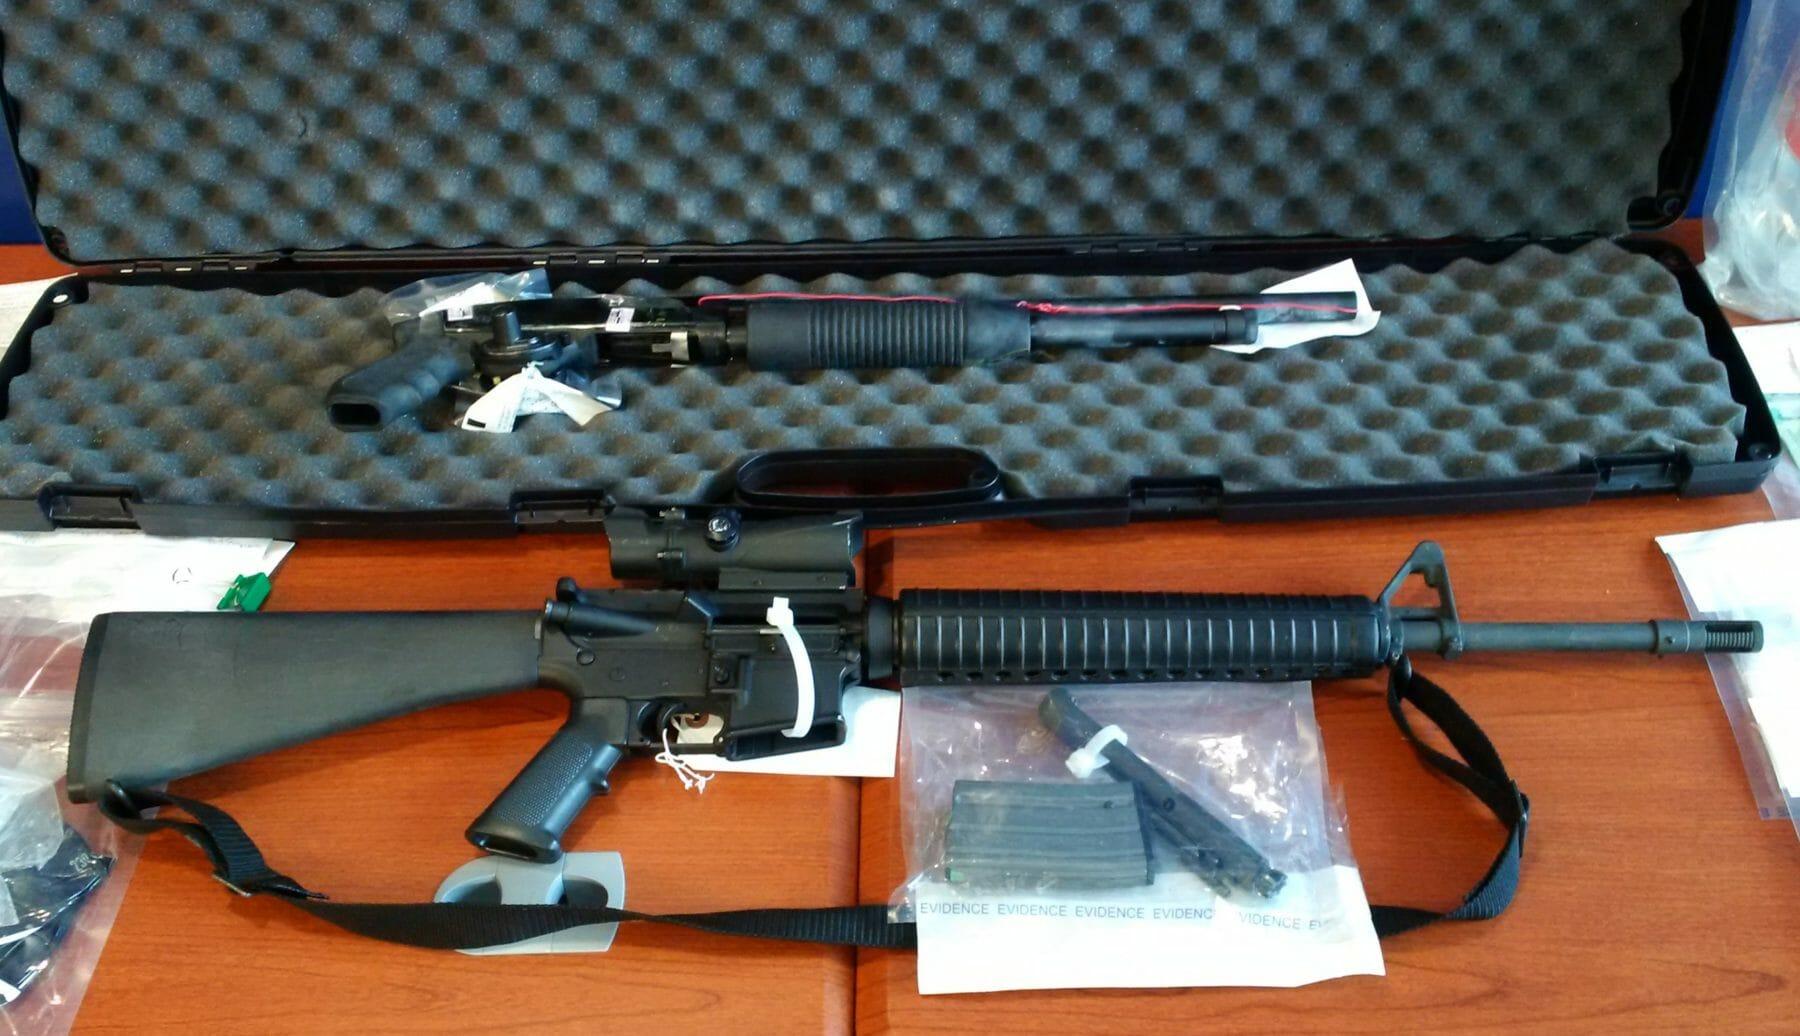 Seized AR-15 and Shotgun